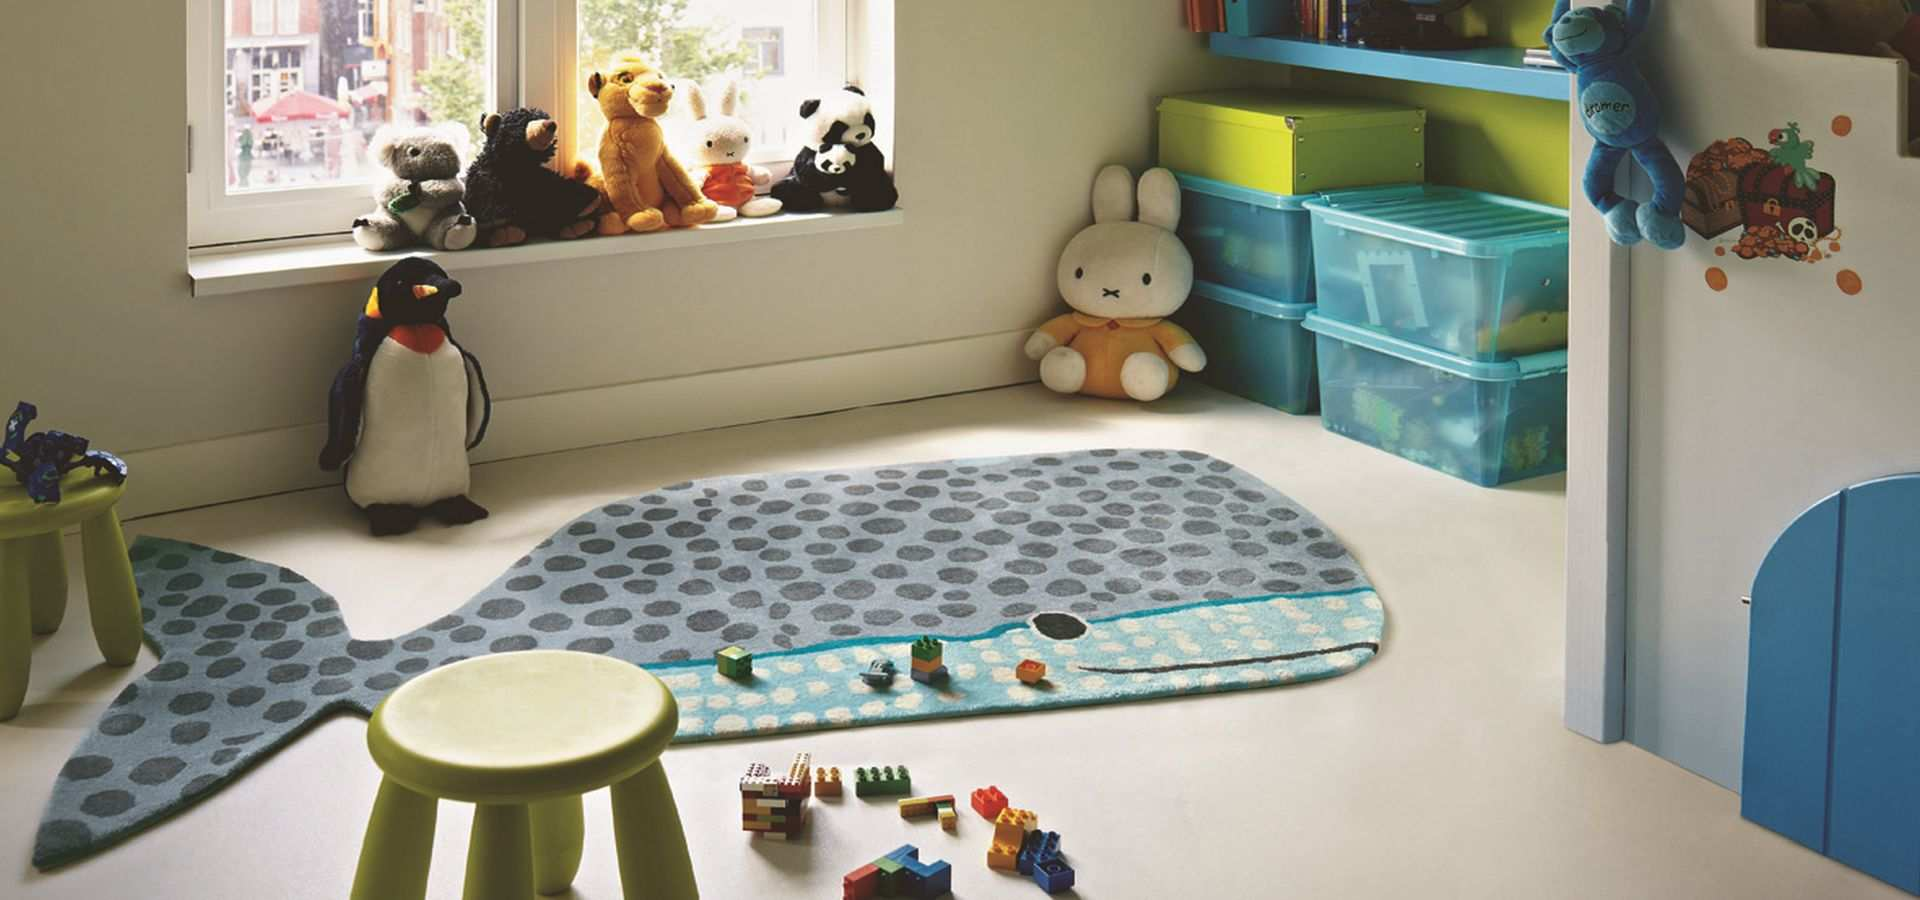 Bild Kinderzimmer Teppich Kids Buddy Wal